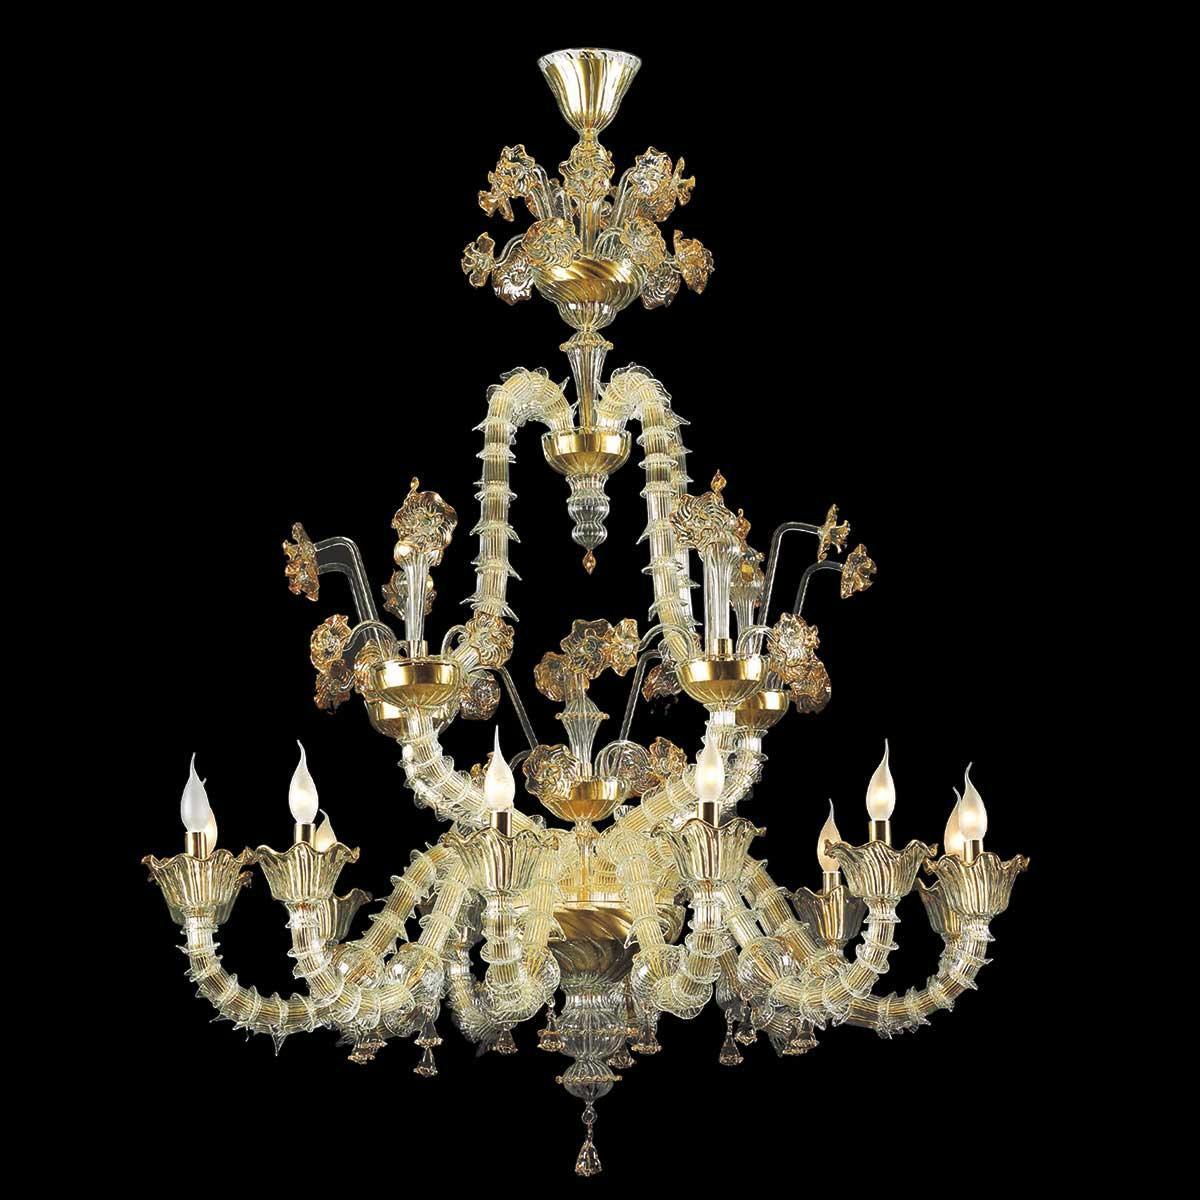 """Merovingio"" lustre en cristal de Murano - 12 lumières - transparent et or"